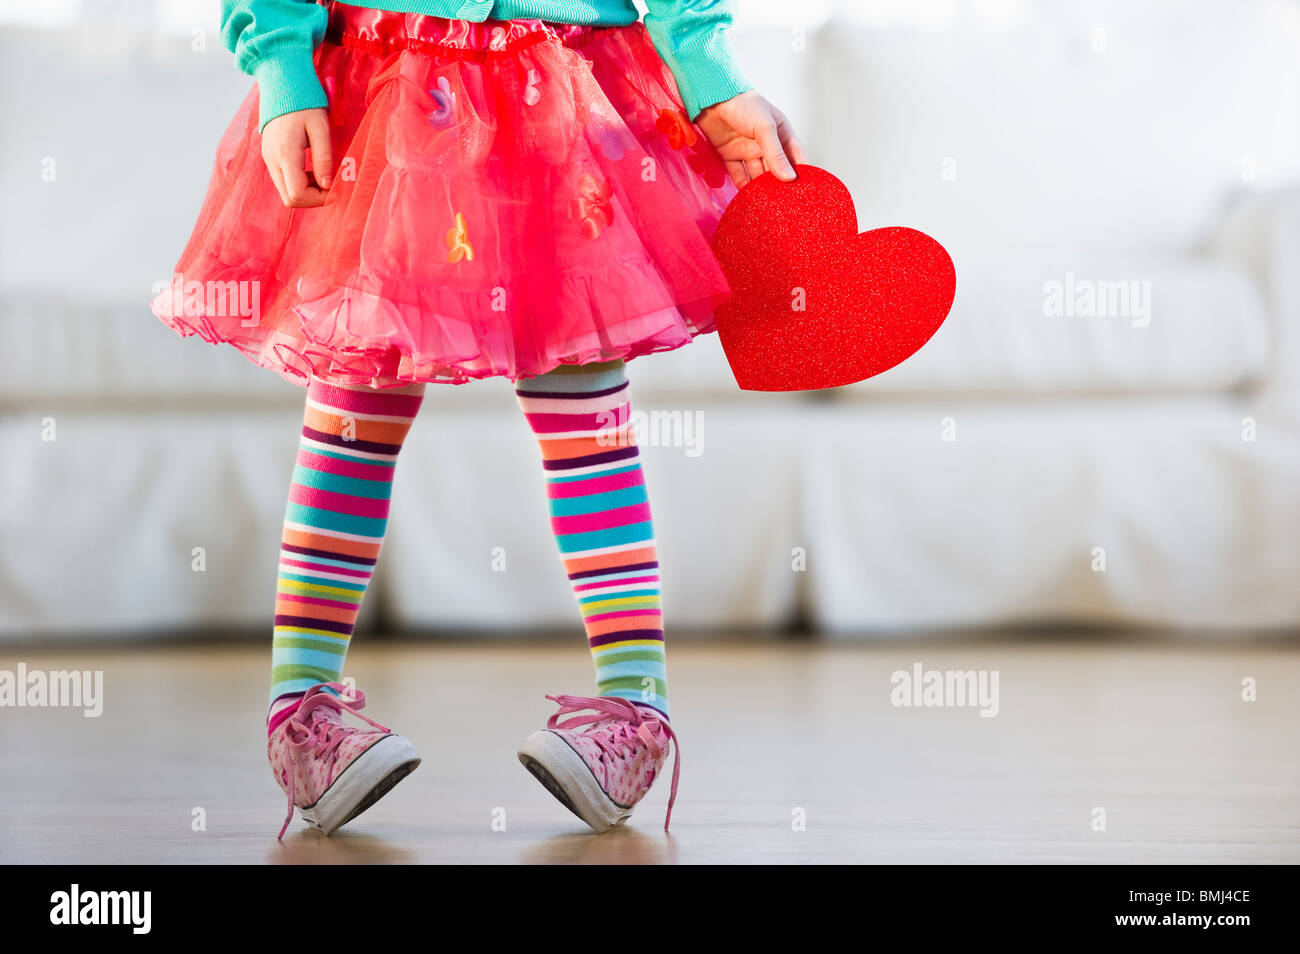 Jovem vestindo collants coloridos Imagens de Stock